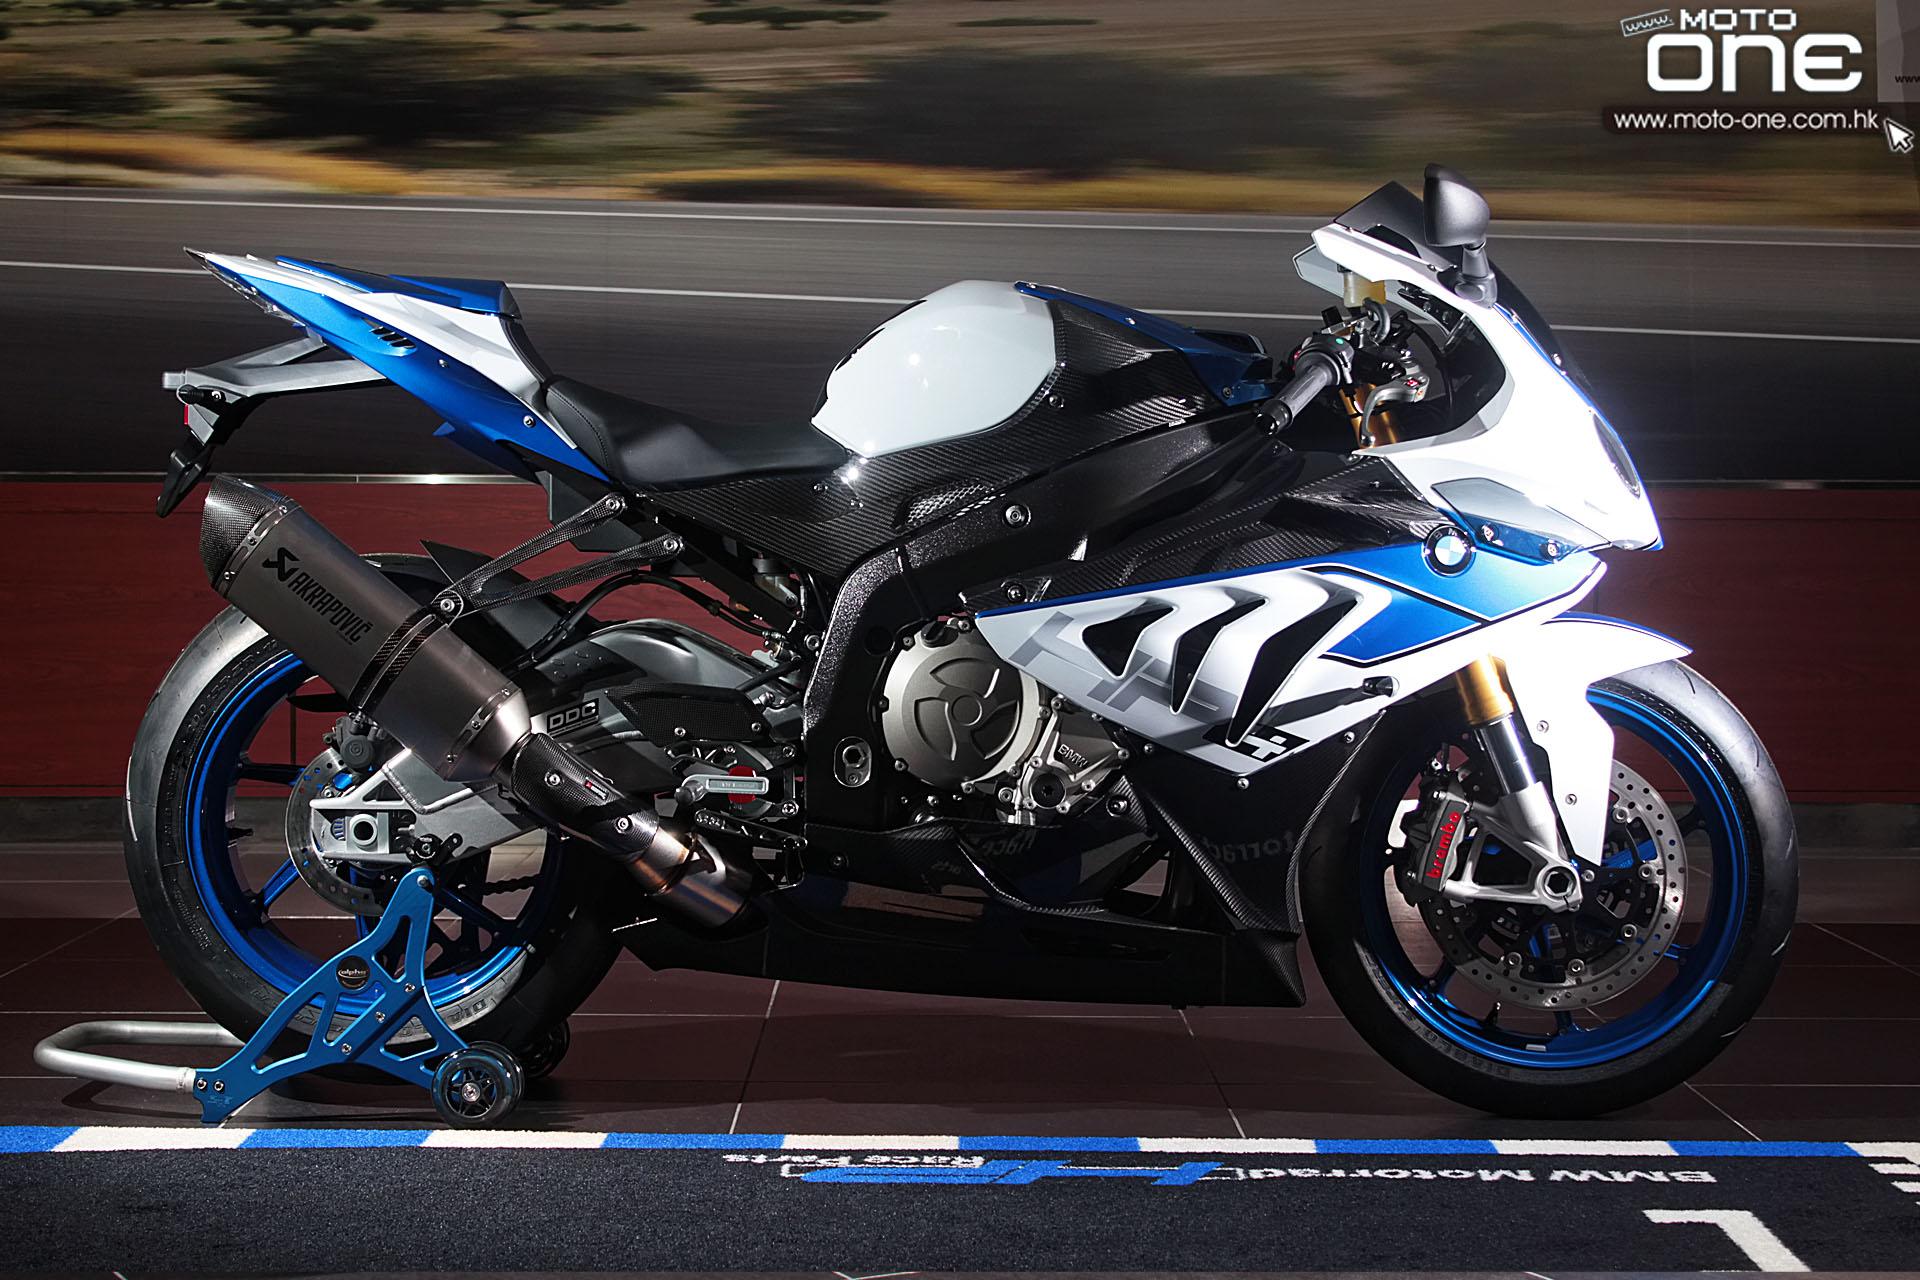 Bmw Motorcycle Hk Price